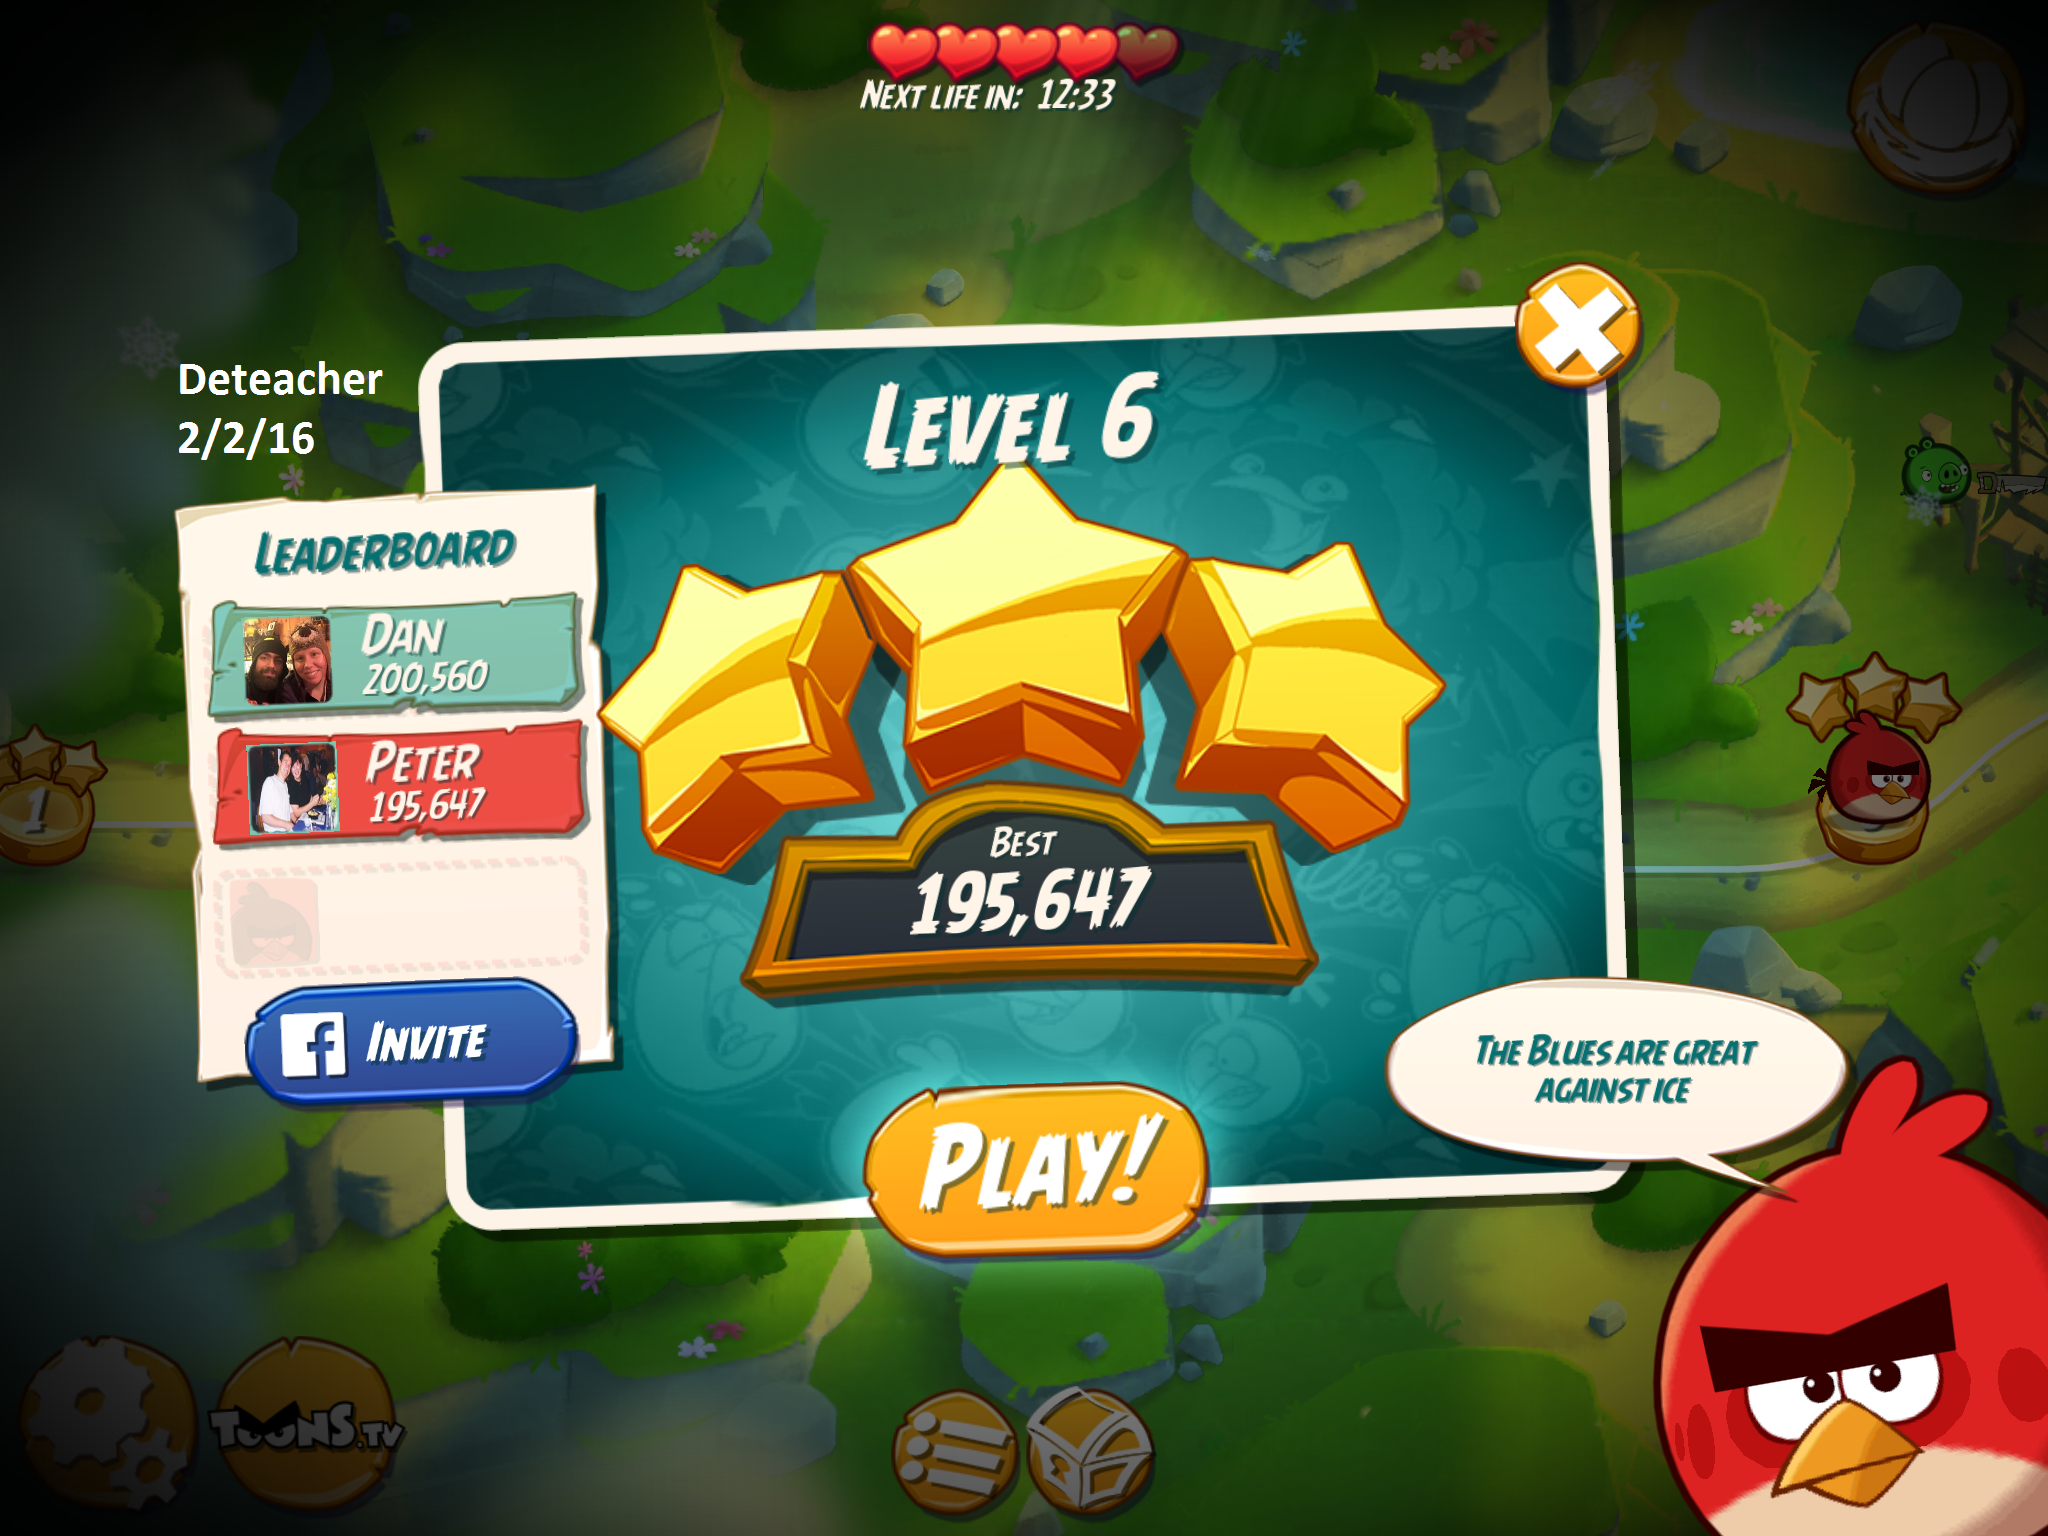 Deteacher: Angry Birds 2: Level 6 (iOS) 195,647 points on 2016-02-02 18:25:23